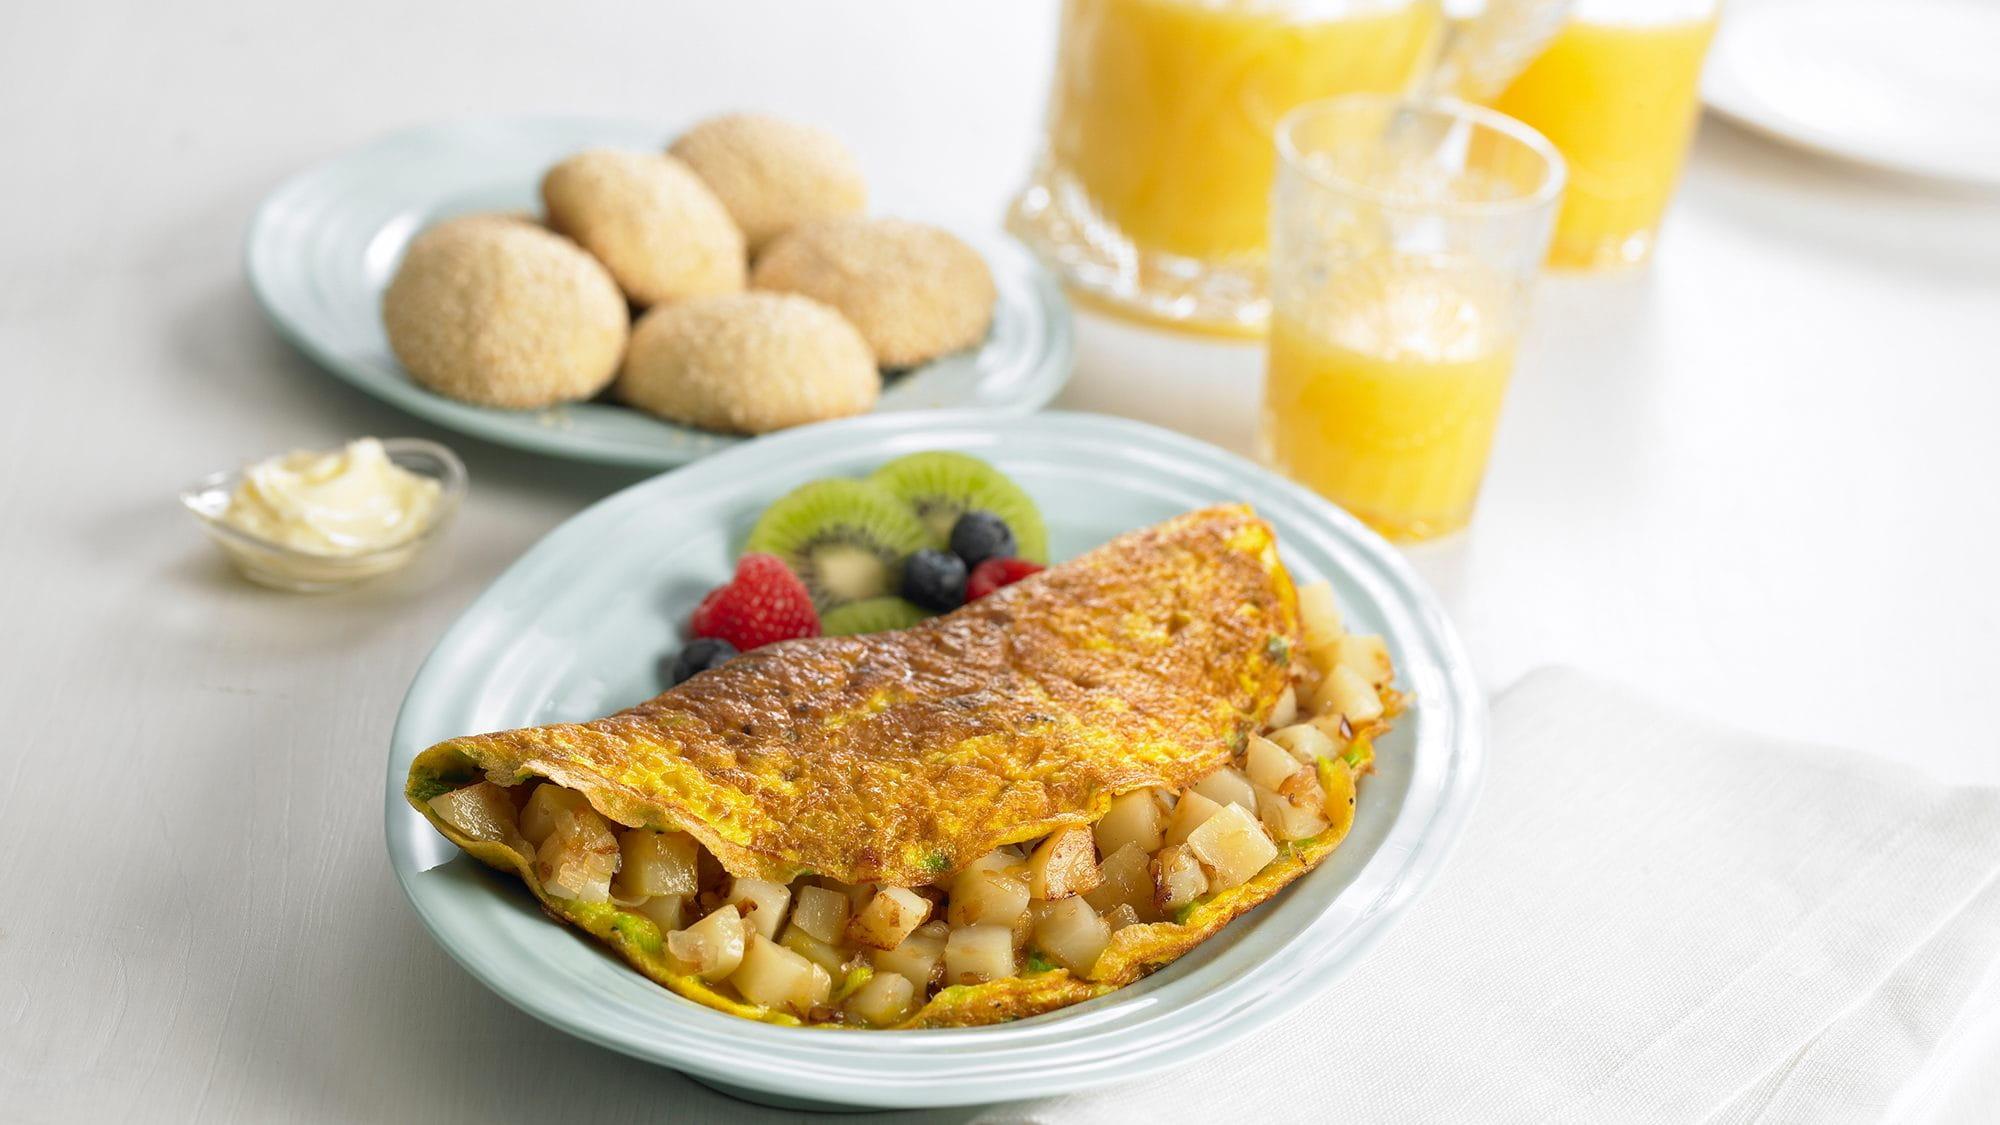 potato-and-saffron-omelet.jpg